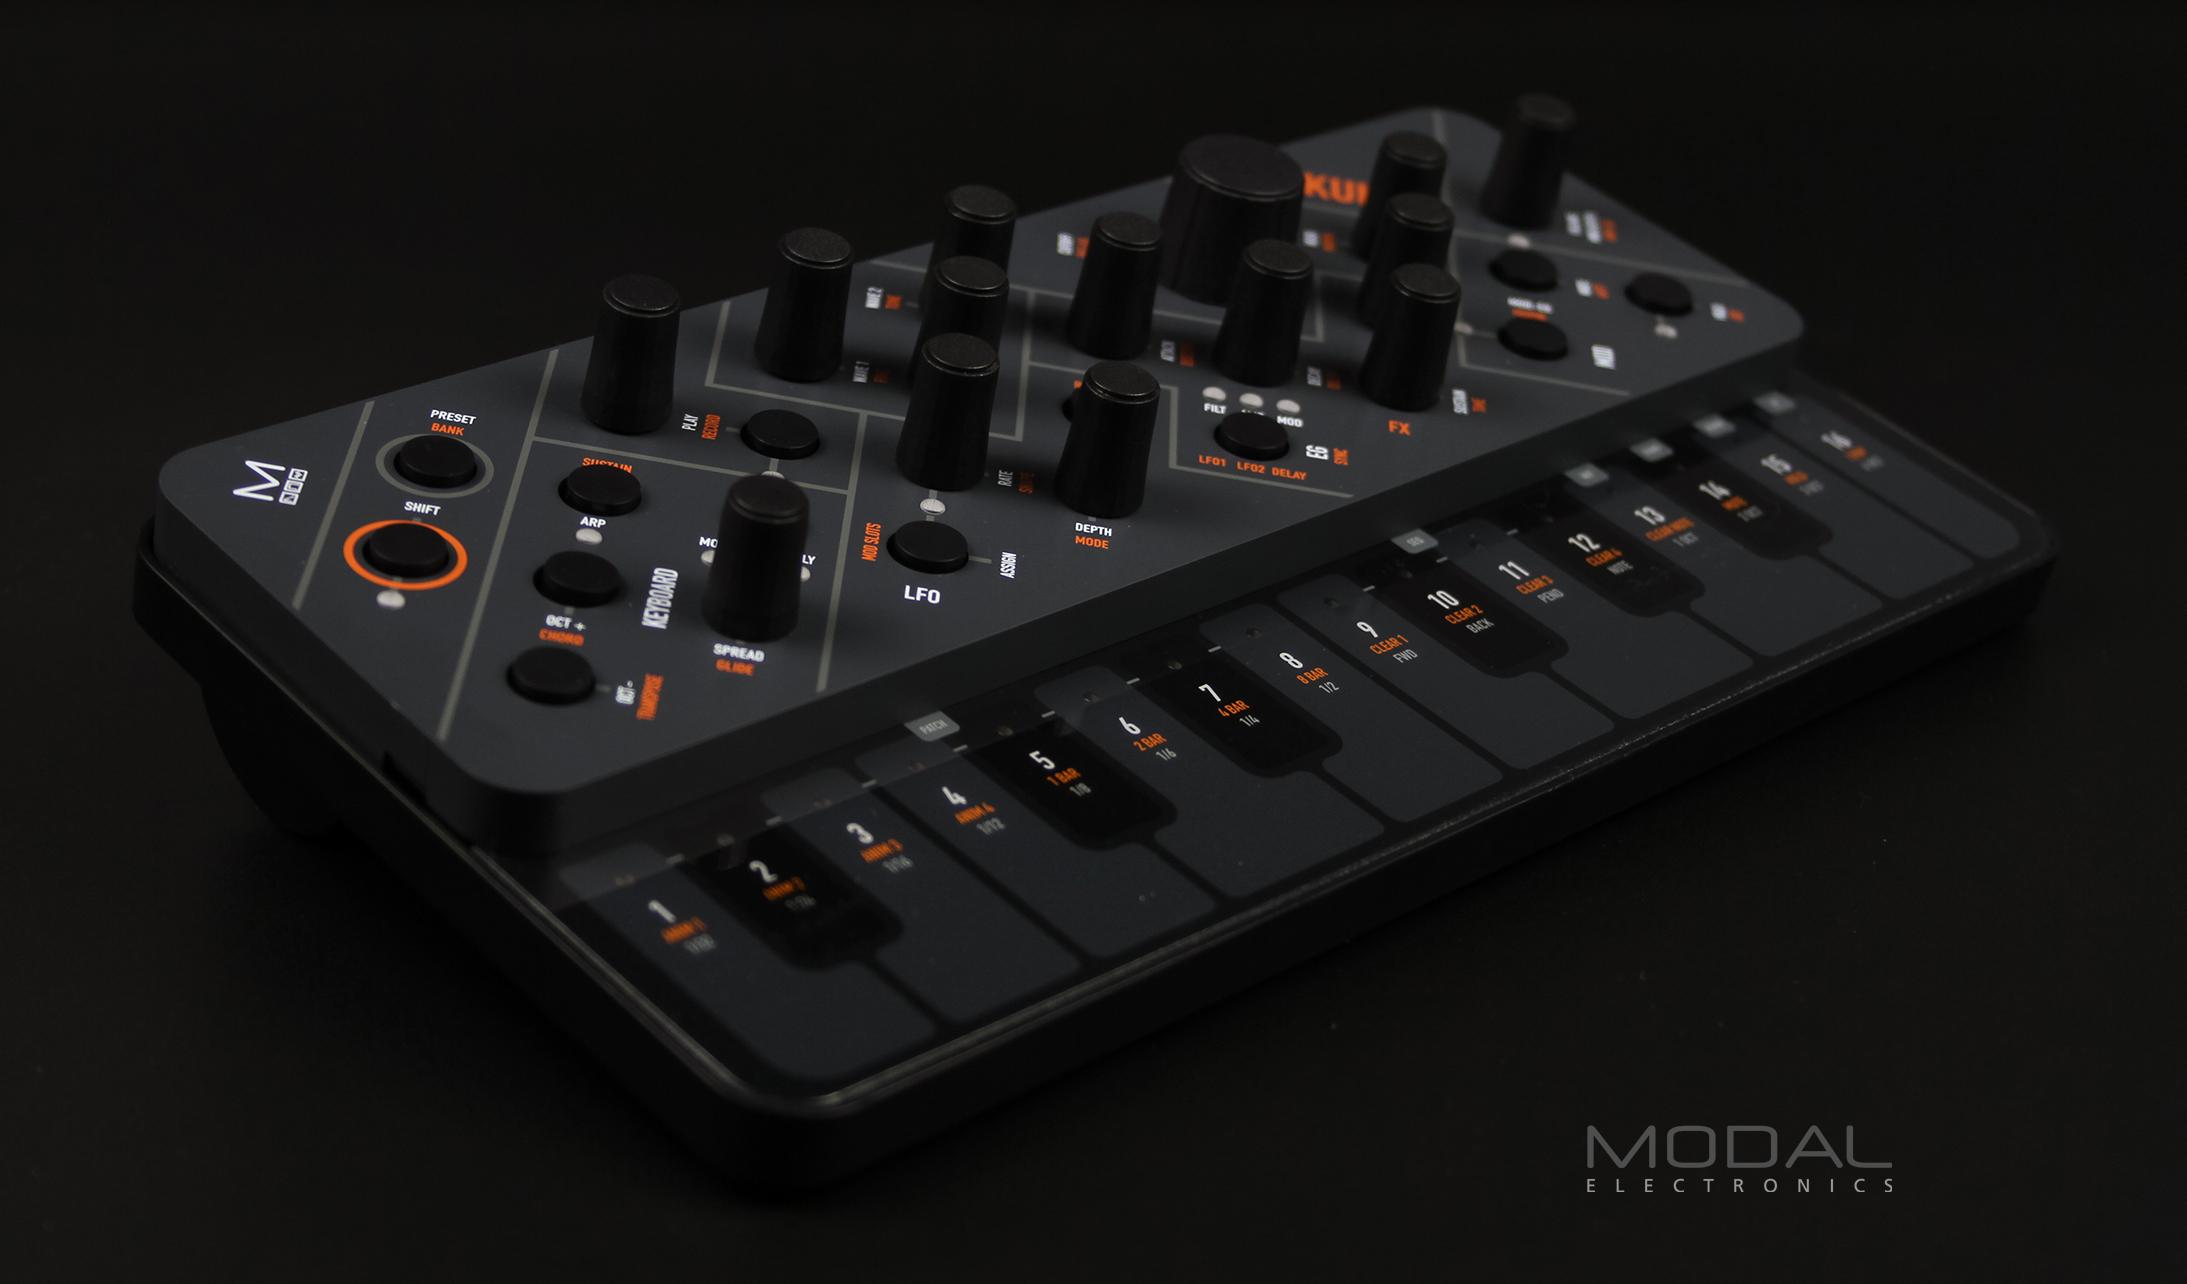 Modal Electronics – Ny agentur hos Fitzpatrick